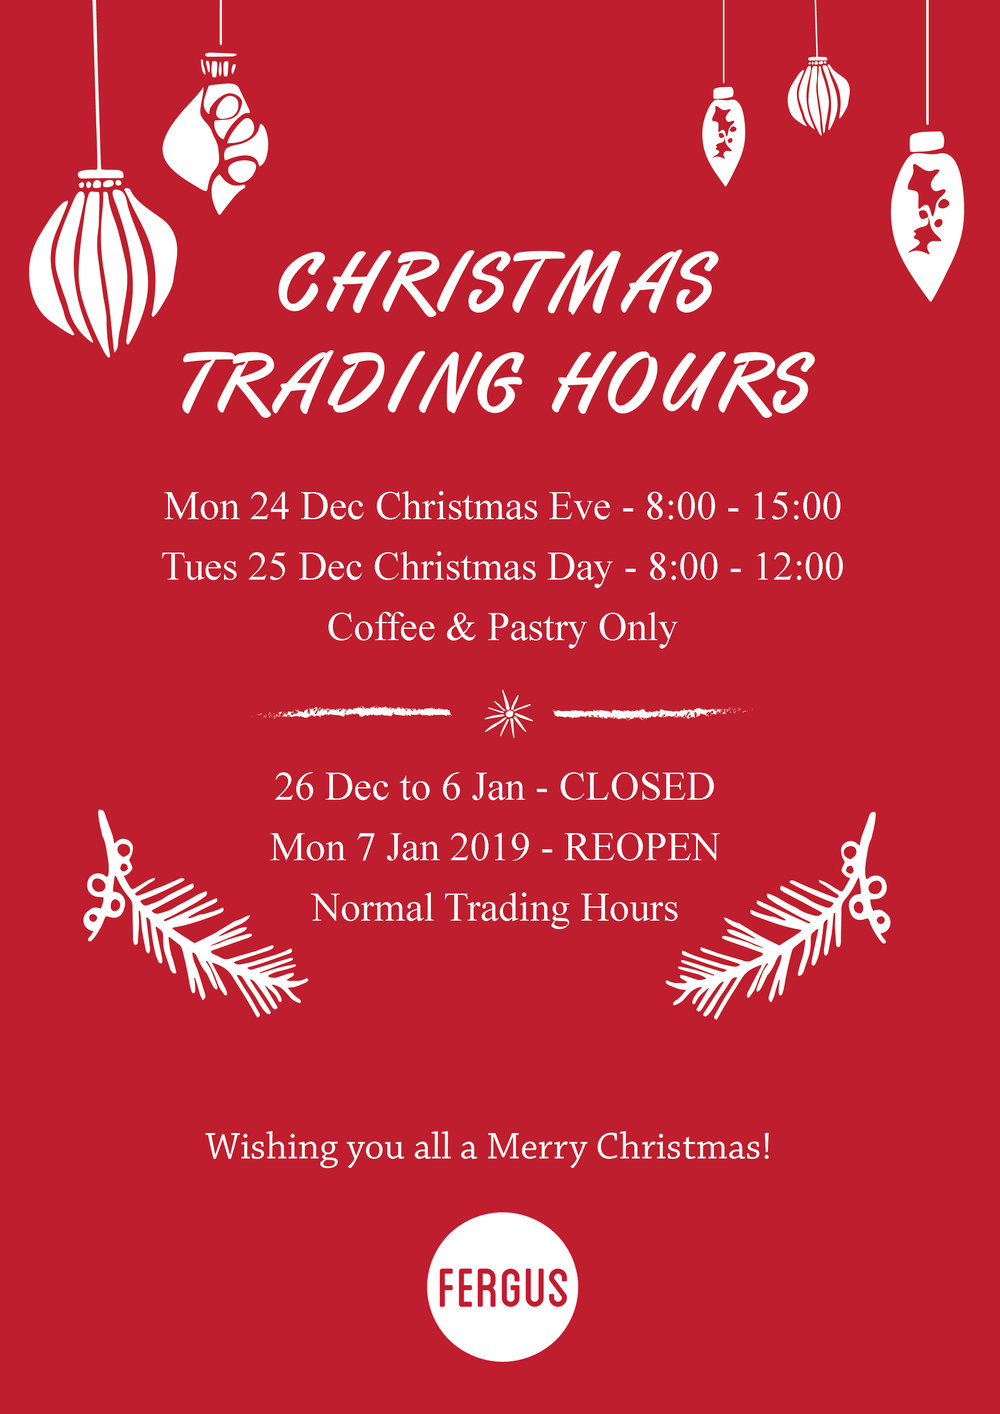 Xmas trading hours.jpg